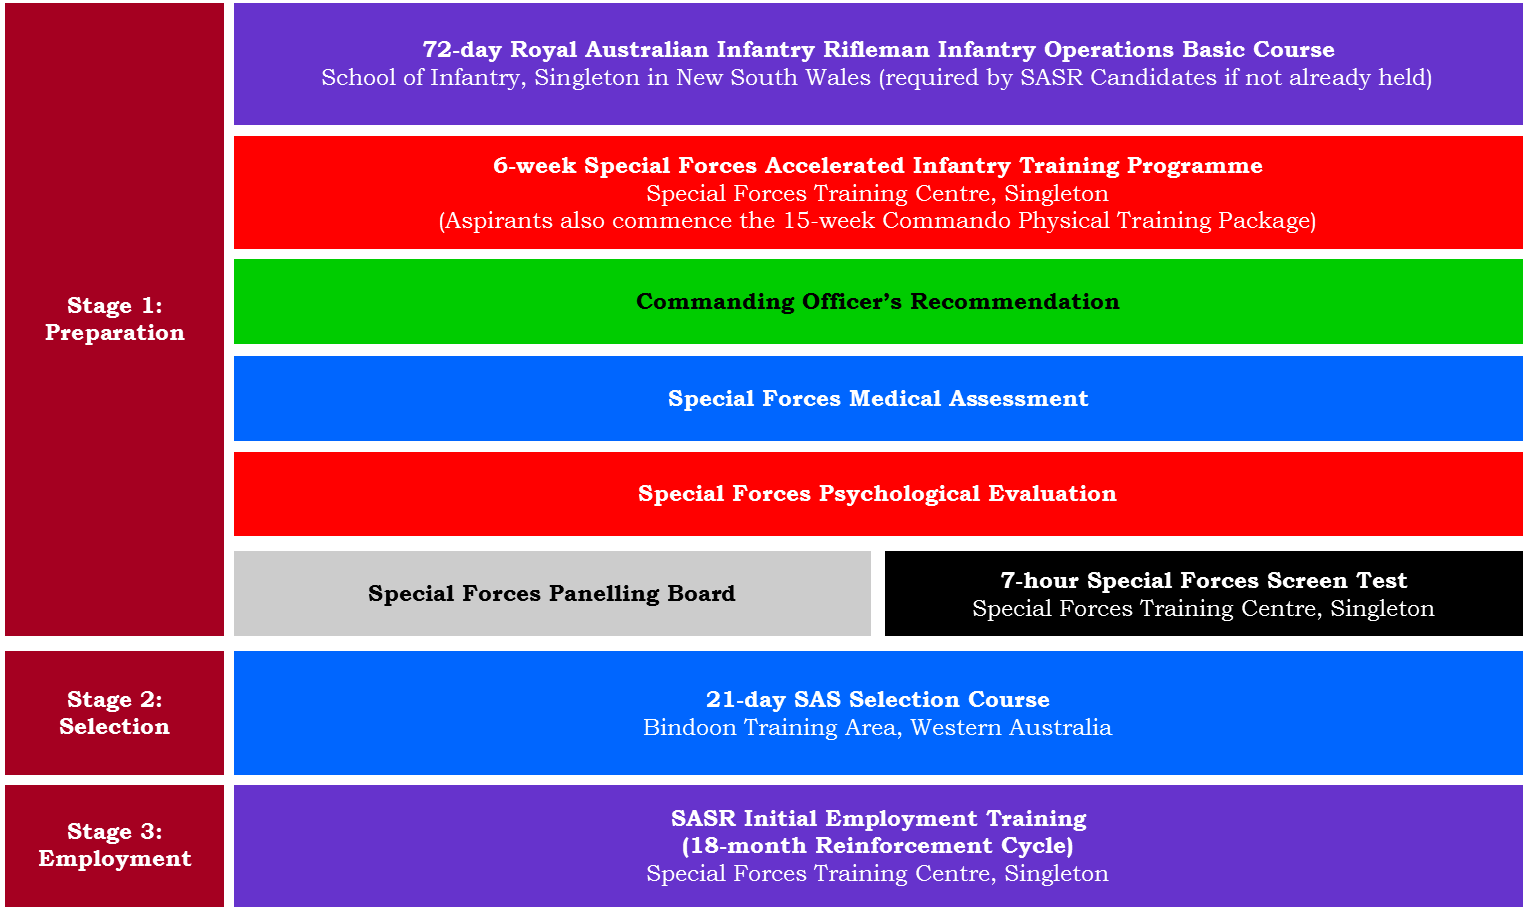 Fitness Program: Australian Special Forces Fitness Program